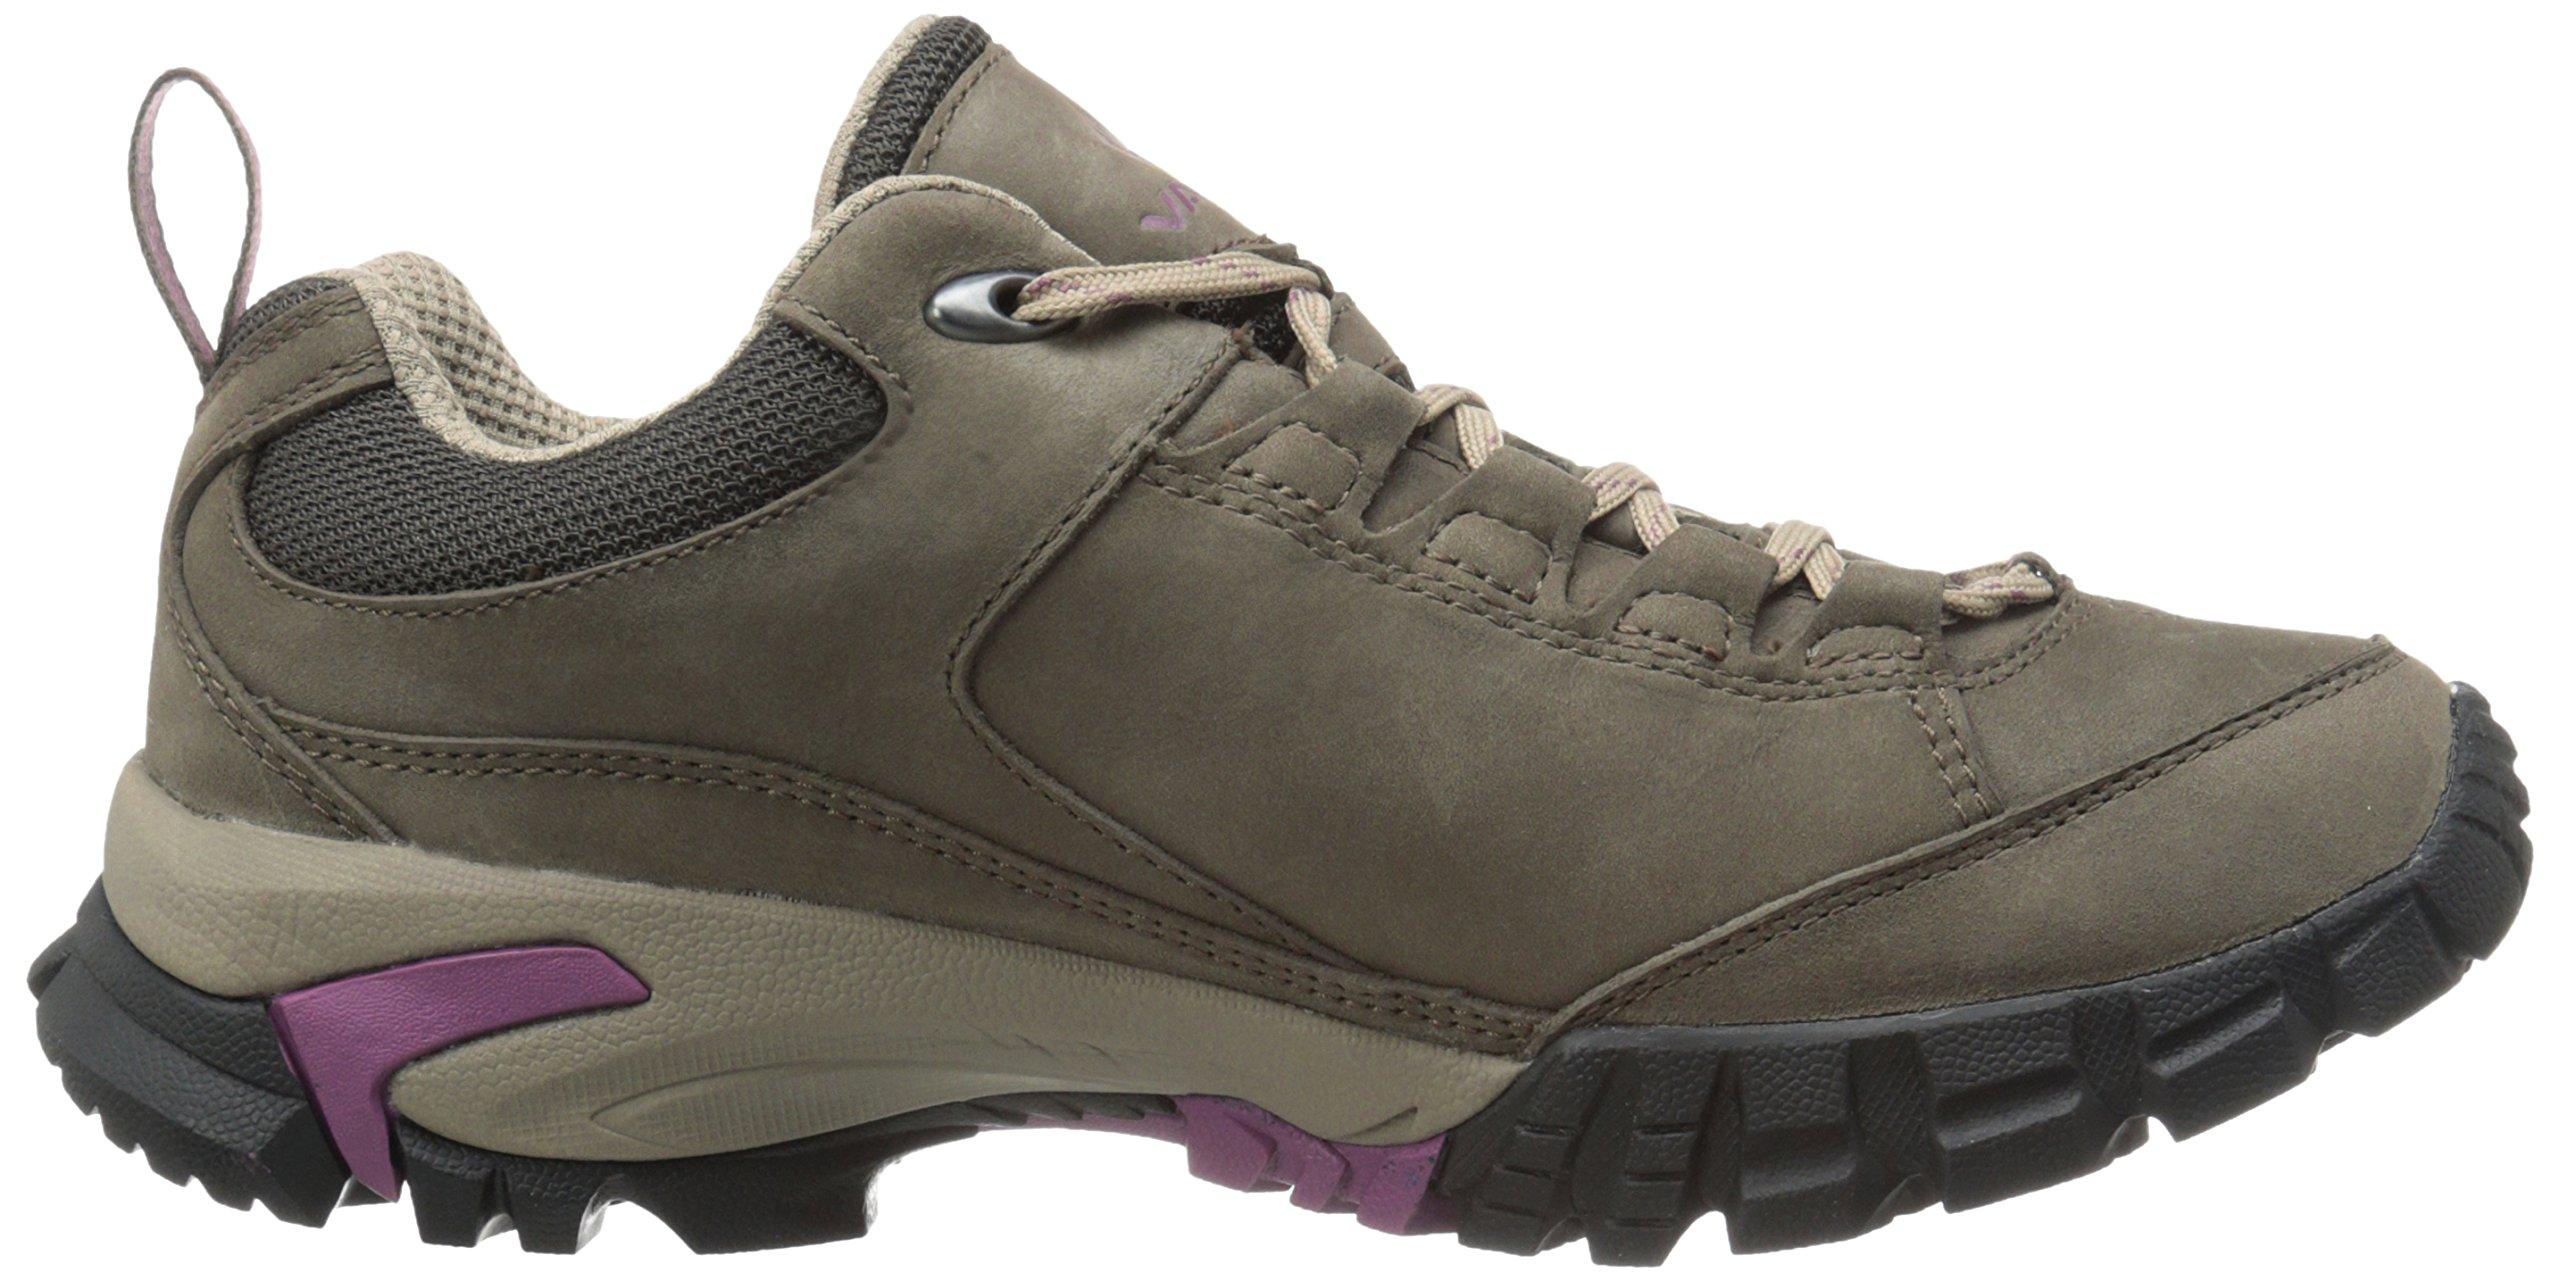 Vasque Women's Talus Trek Low UltraDry Hiking Shoe, Black Olive/Damson, 8.5 M US by Vasque (Image #7)